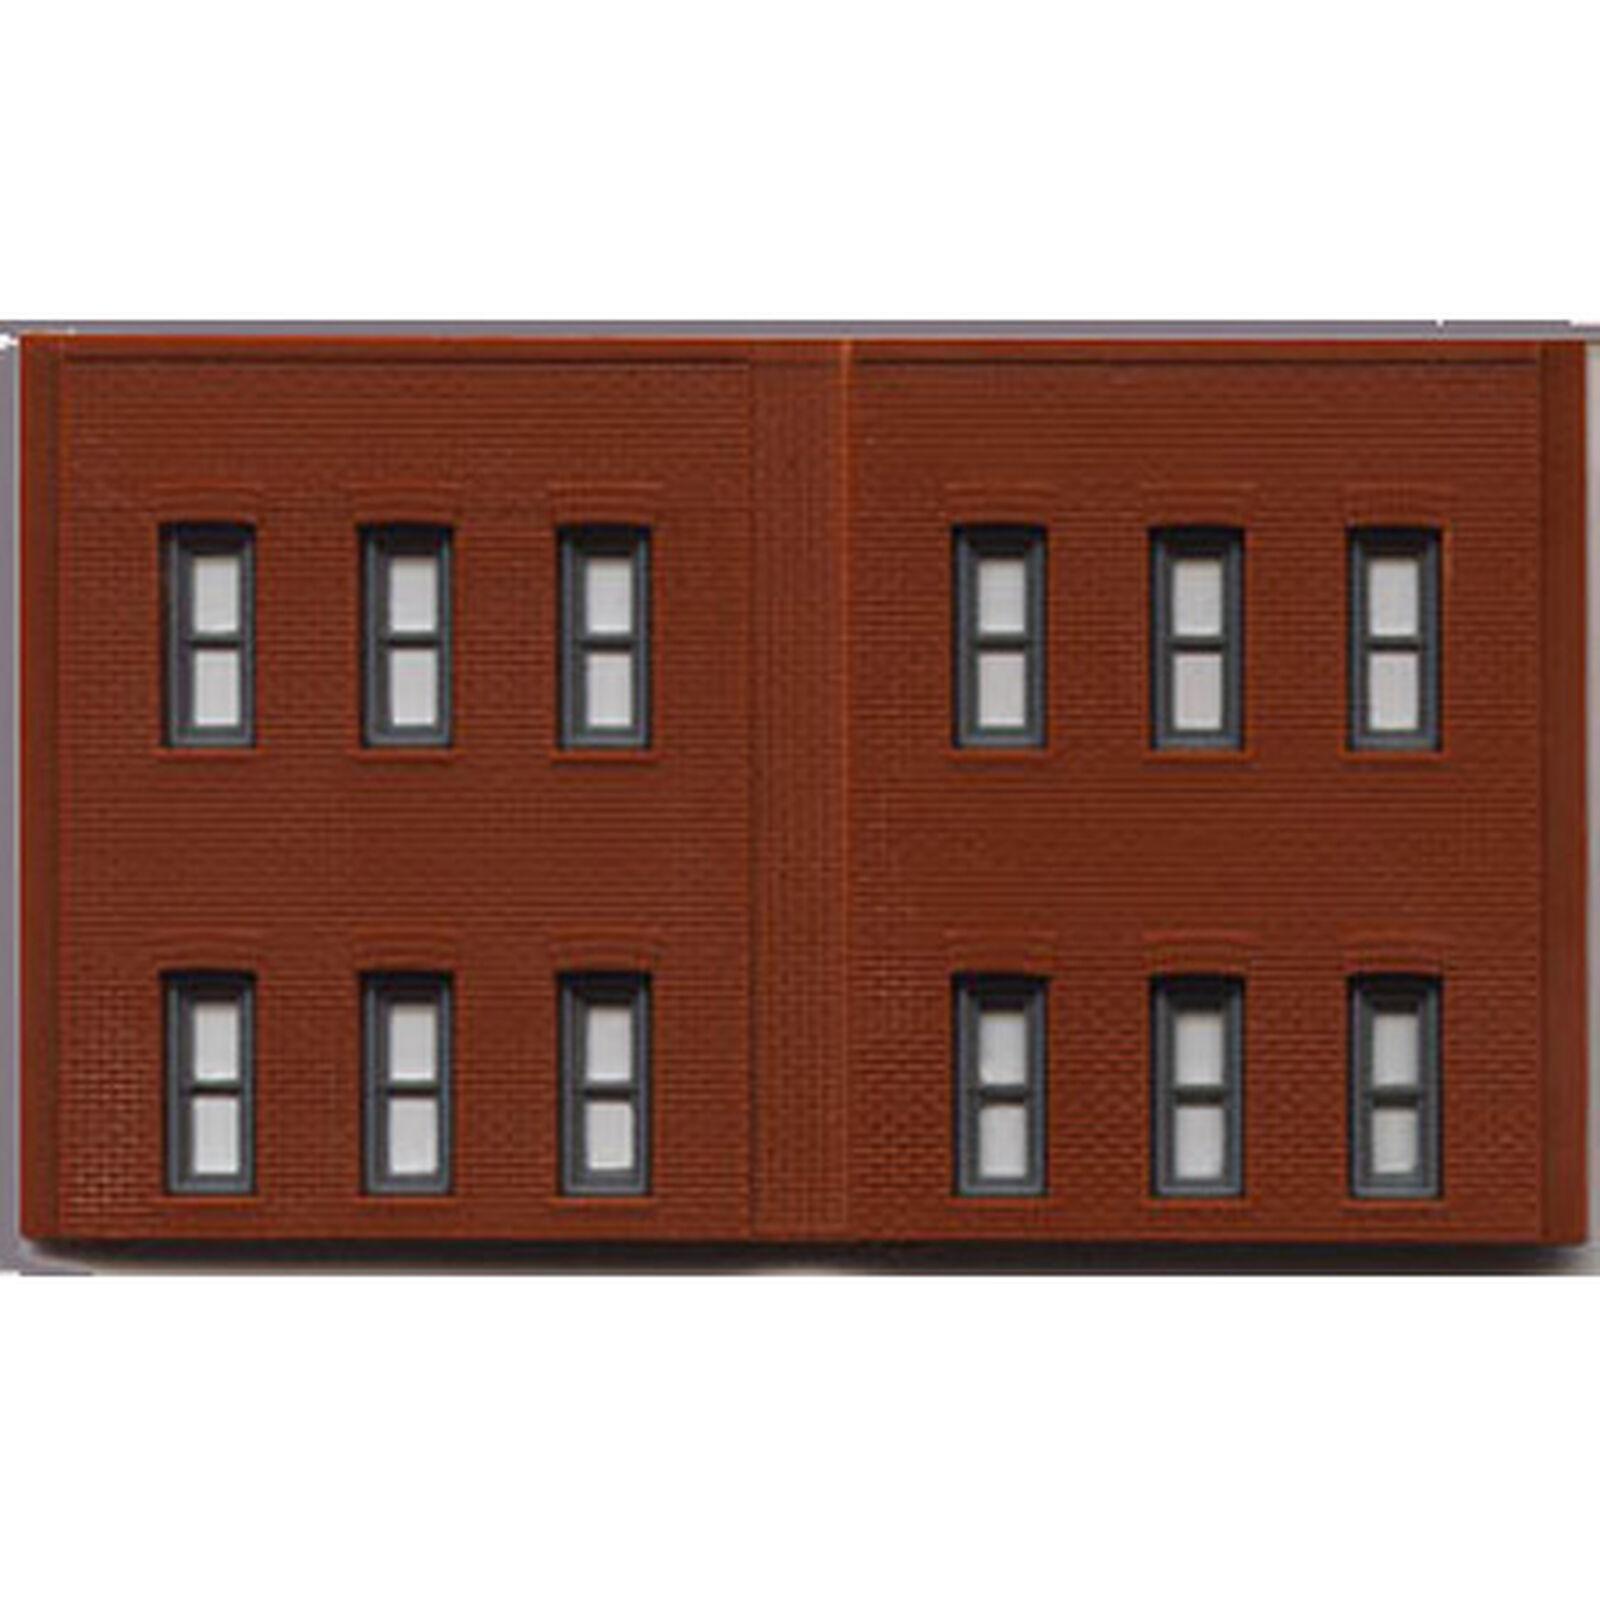 N DPM 2 Story Wall/12 Windows (3)